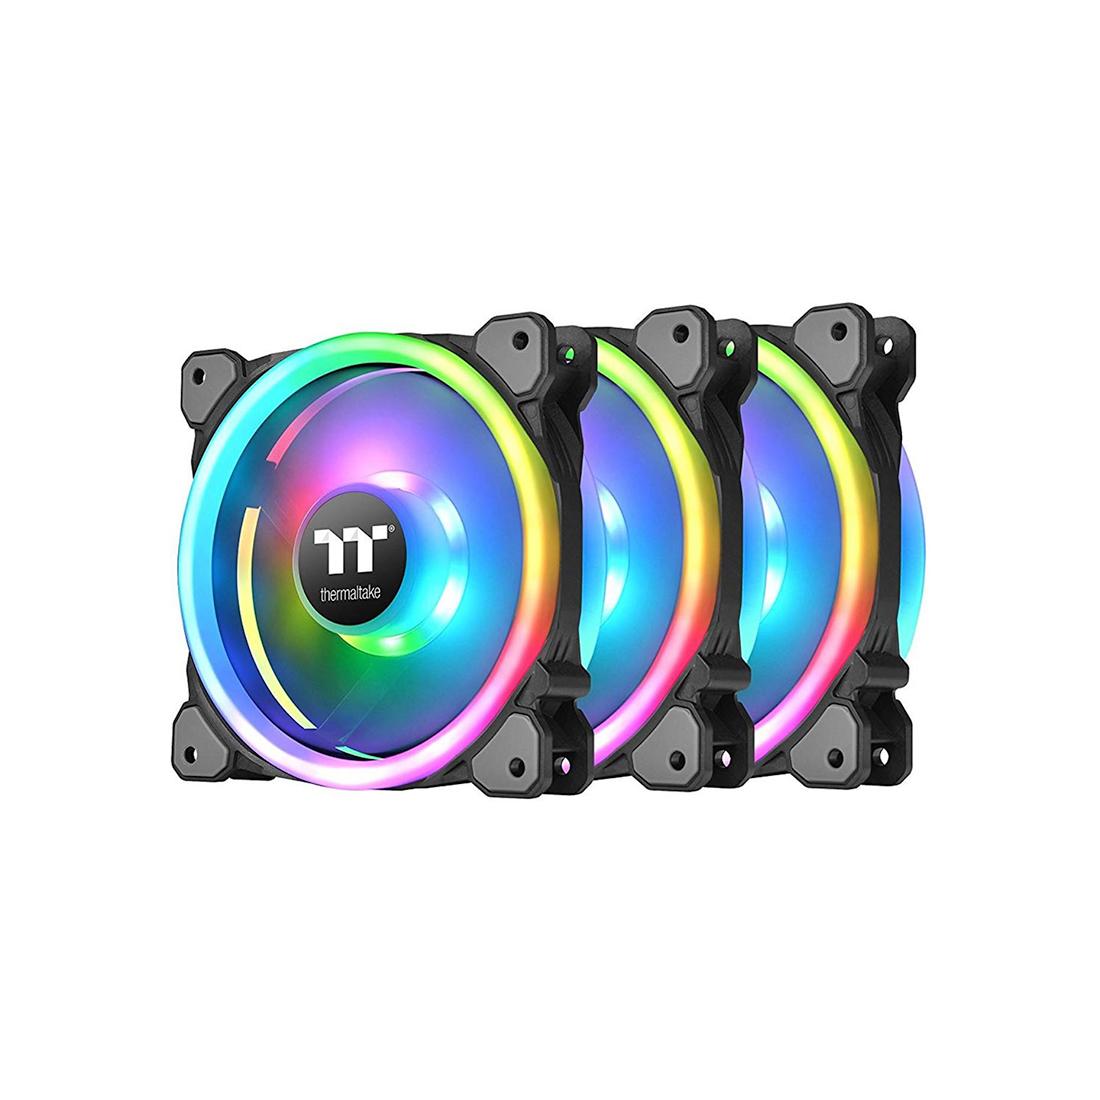 Кулер для компьютерного корпуса Thermaltake Riing Trio 12 RGB TT Premium Edition (3-Fan Pack)